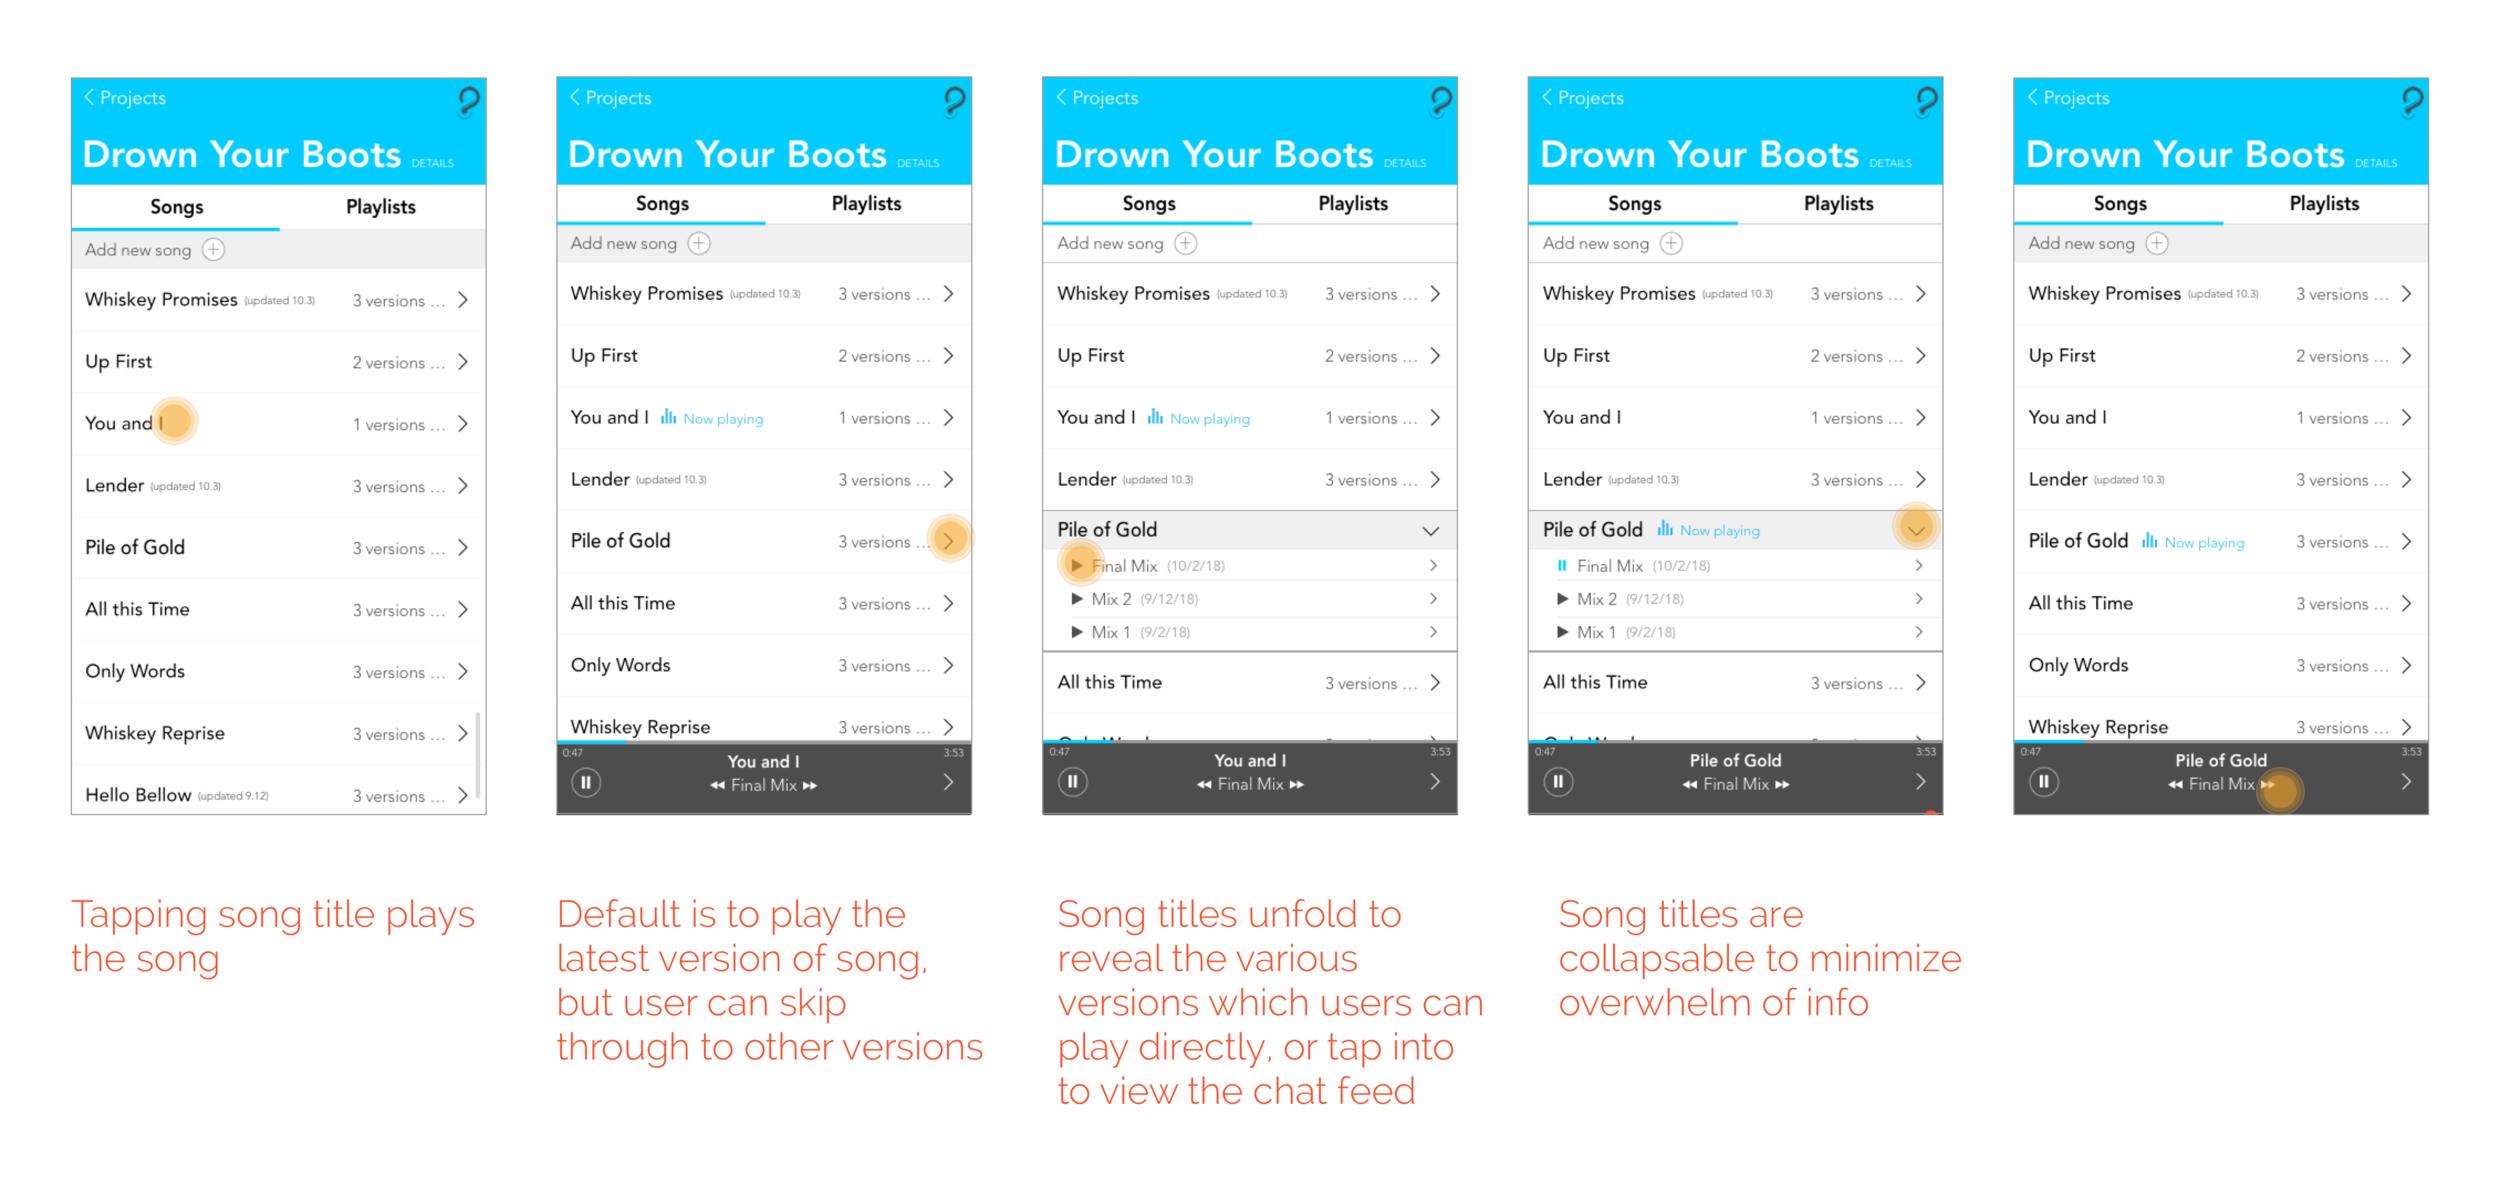 Mobile Project View Flow Copy@2x.png